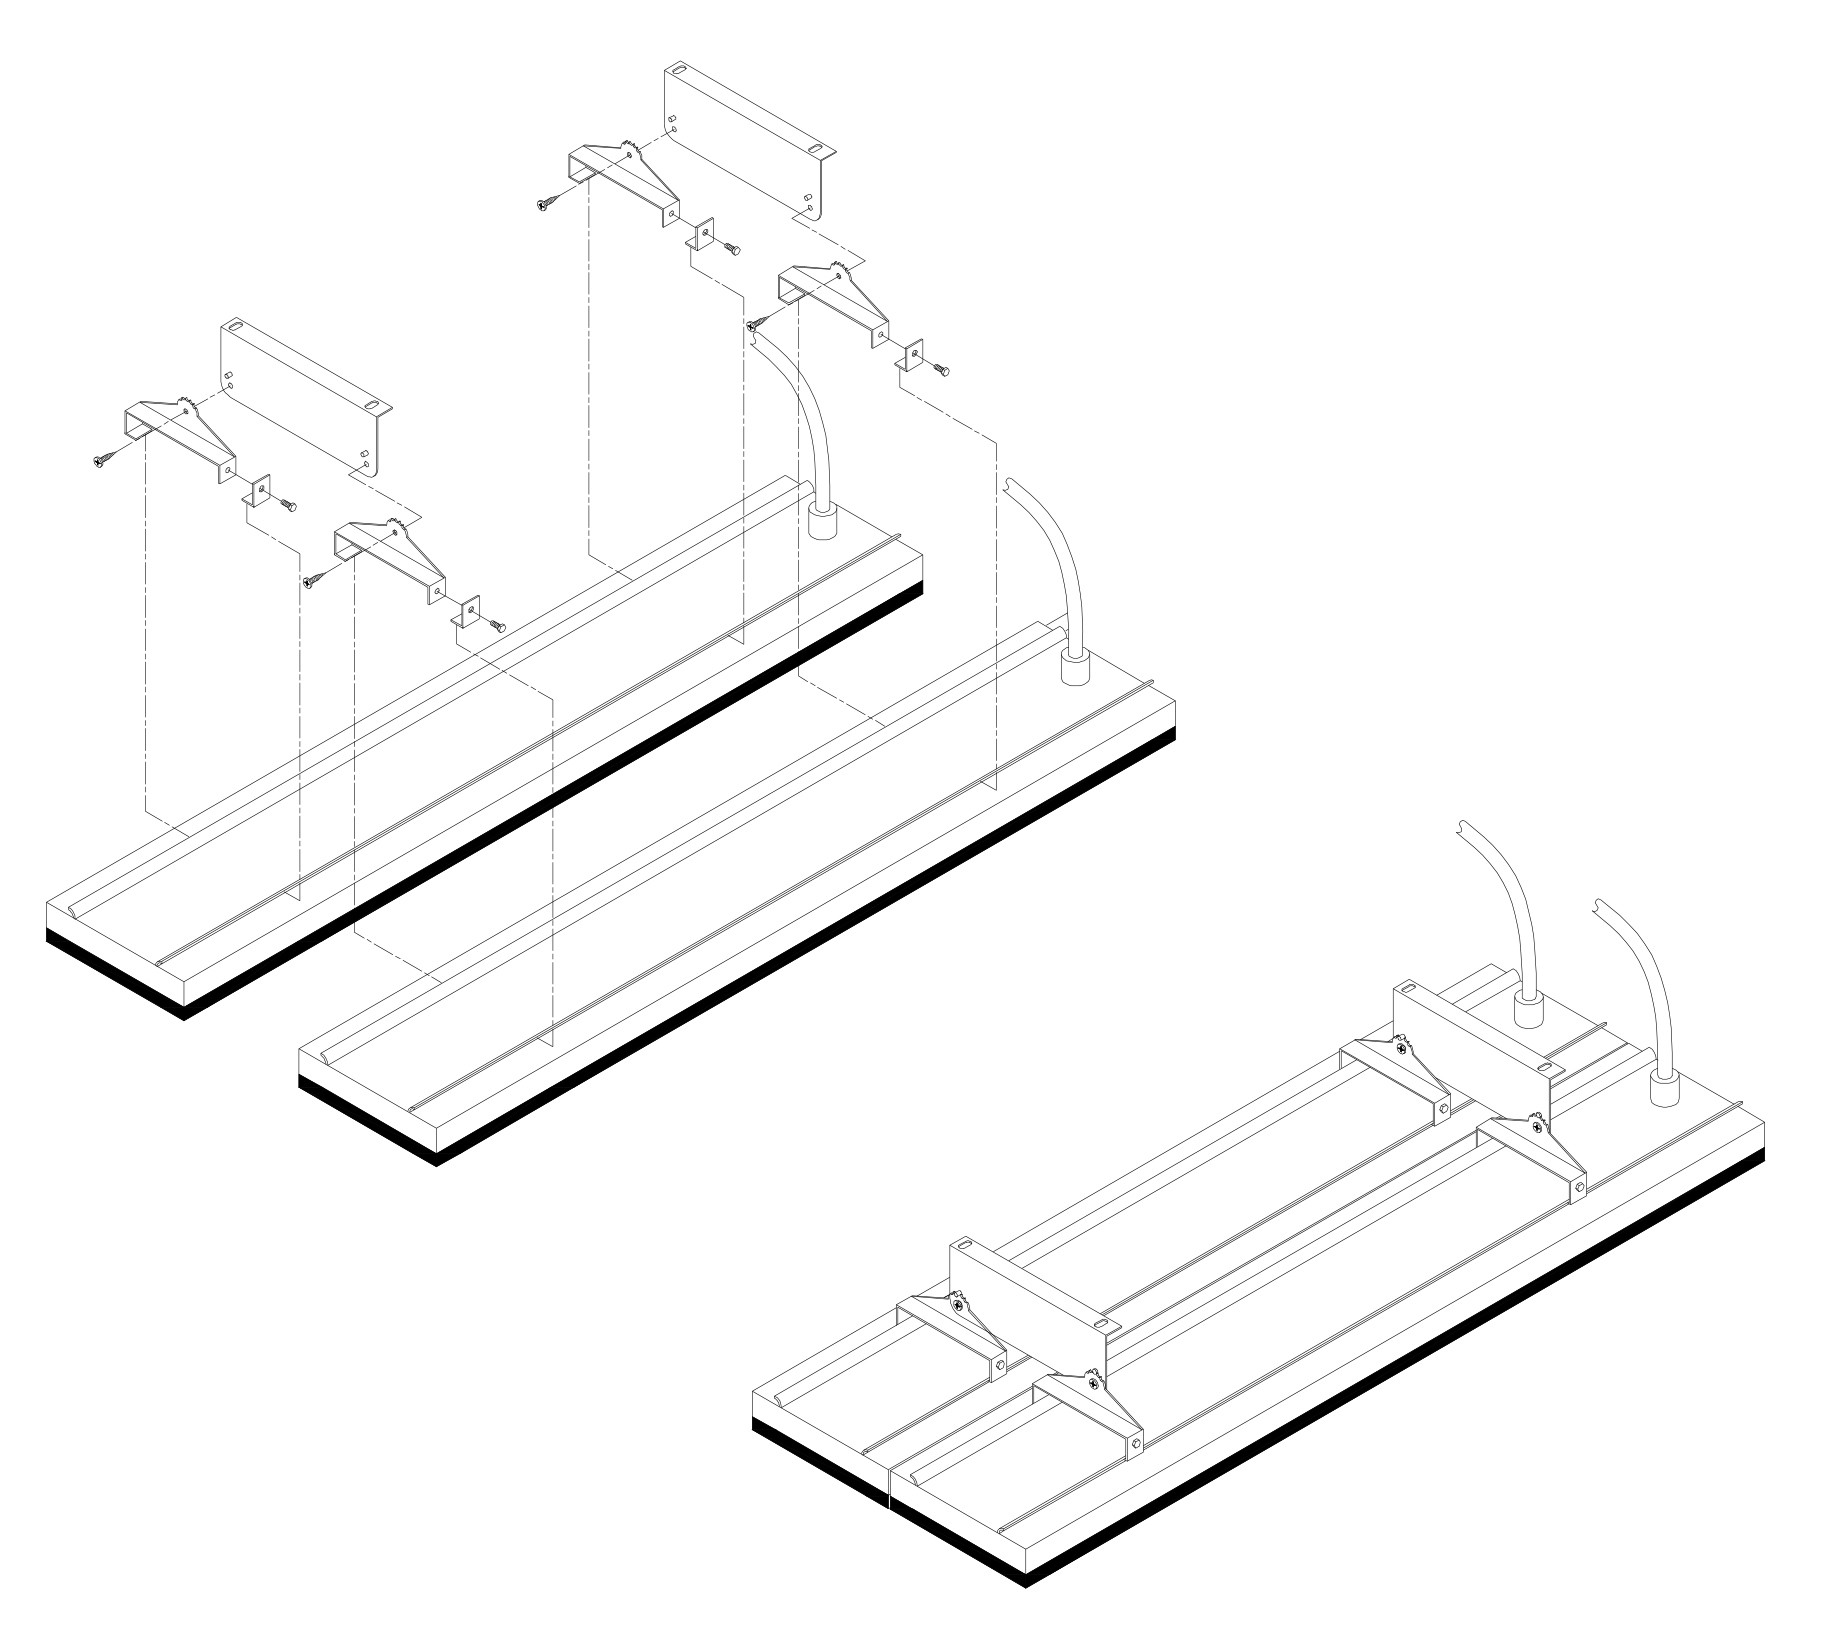 Kit montage double pour gamme THH (Design)